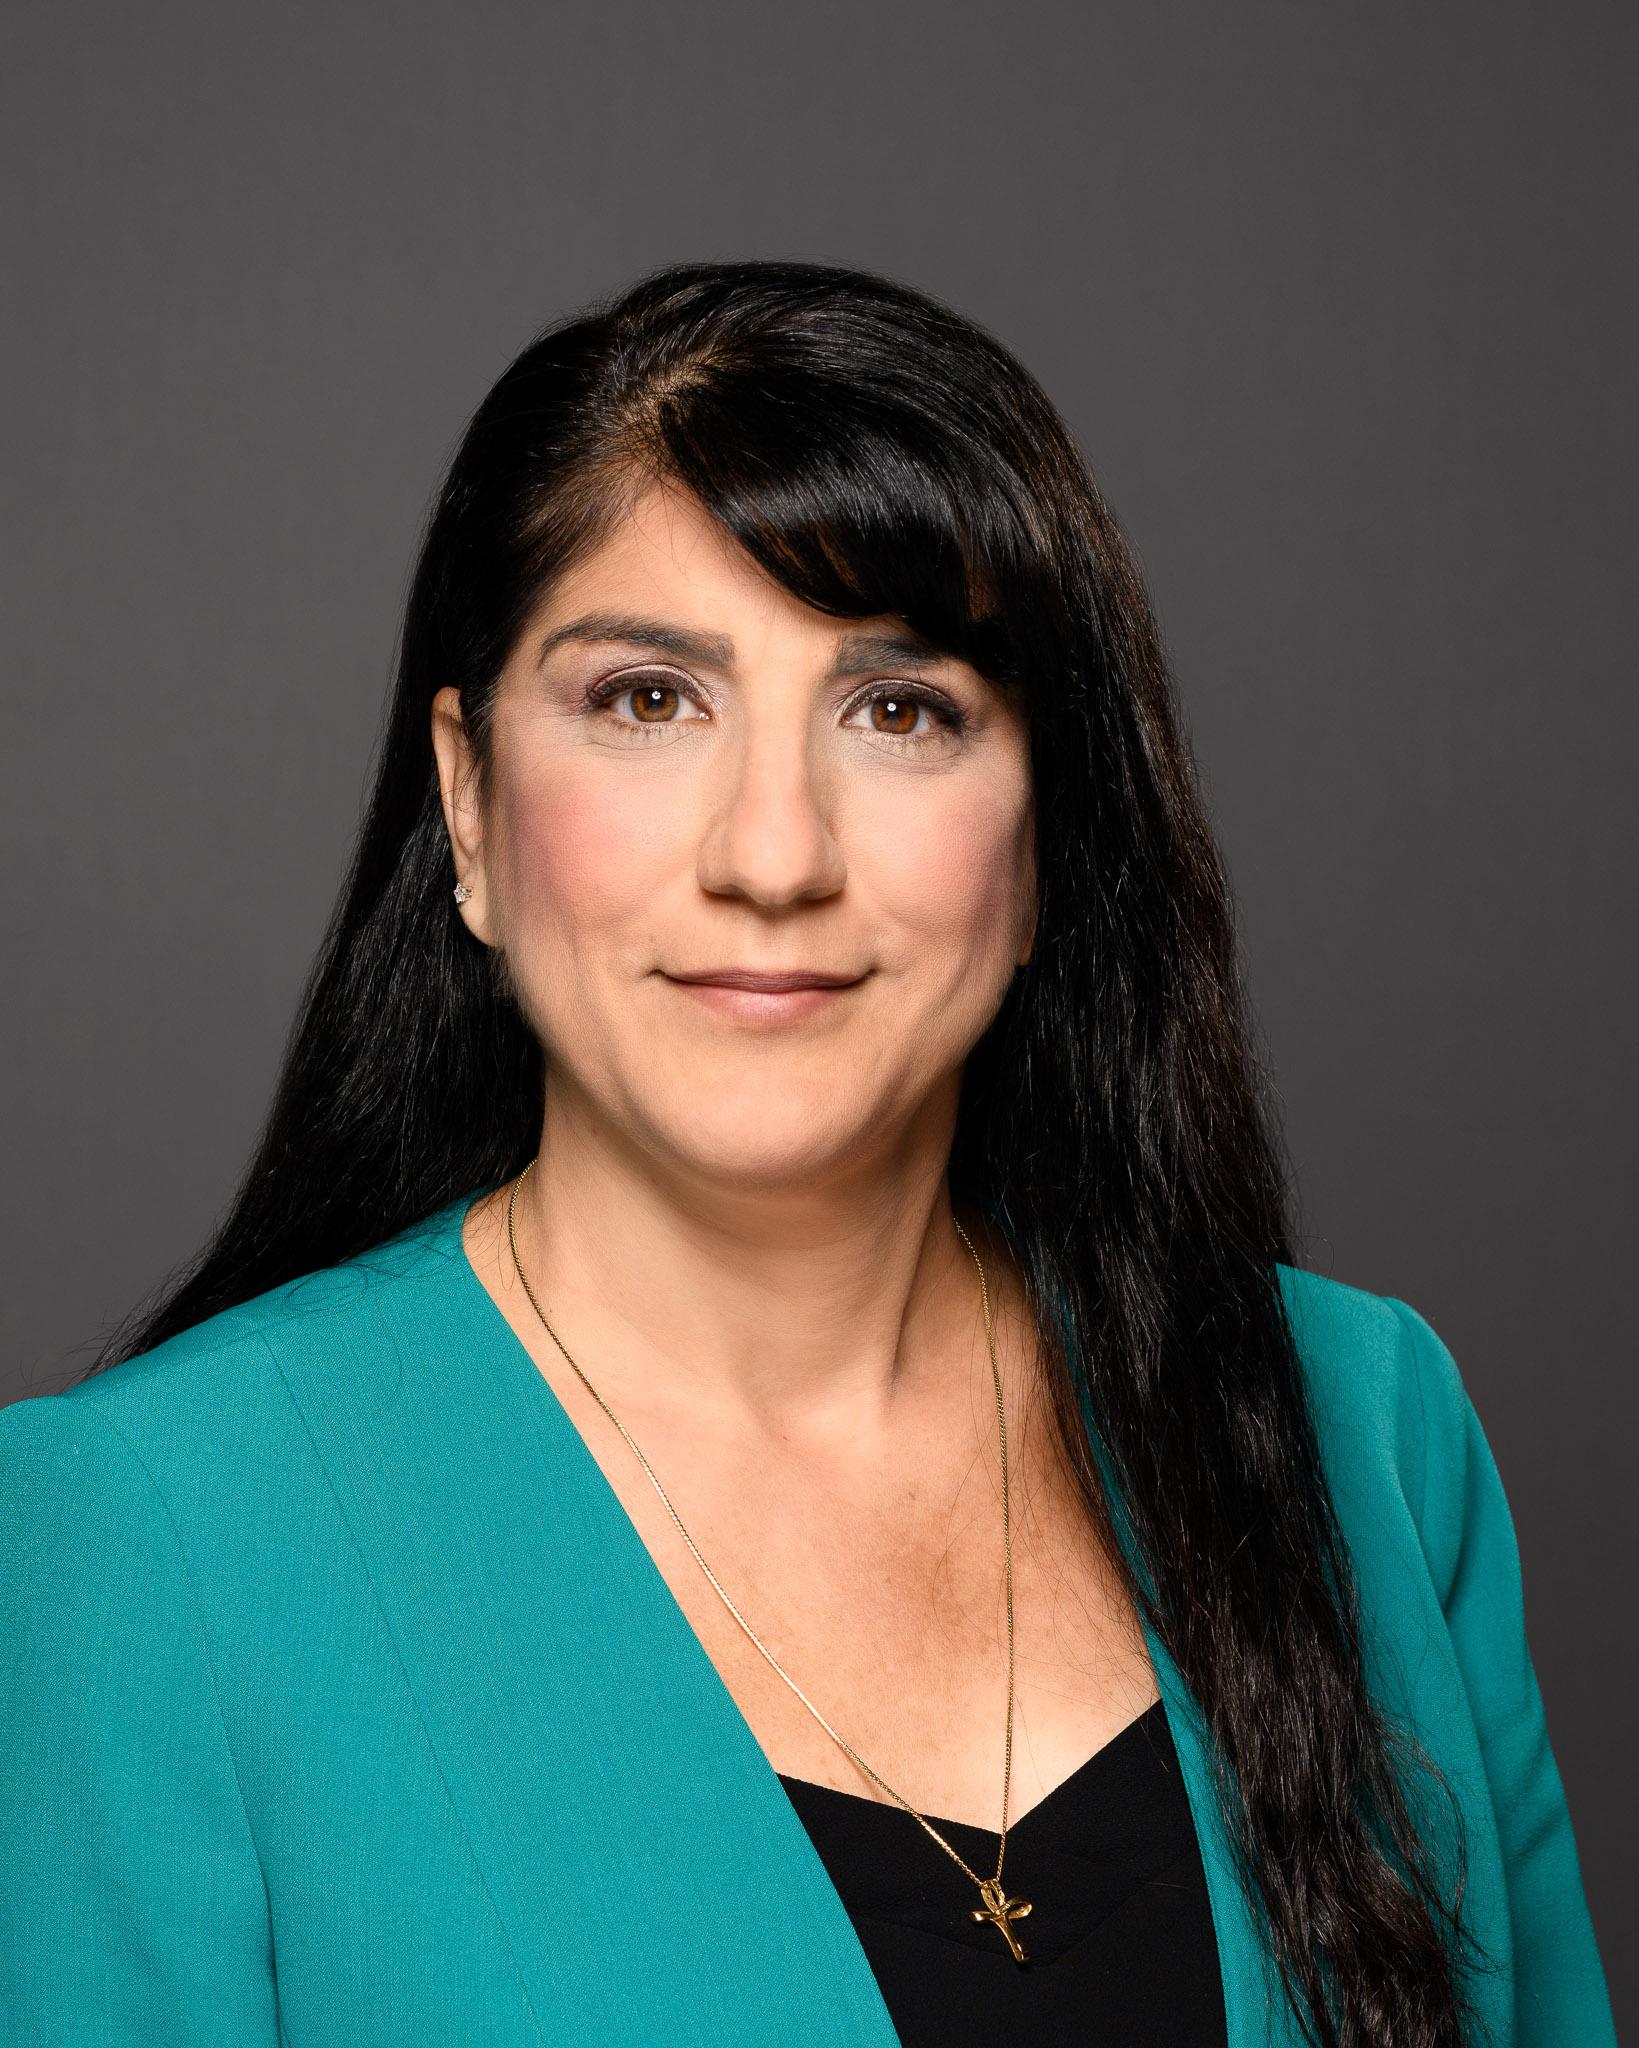 Marisa Carpino